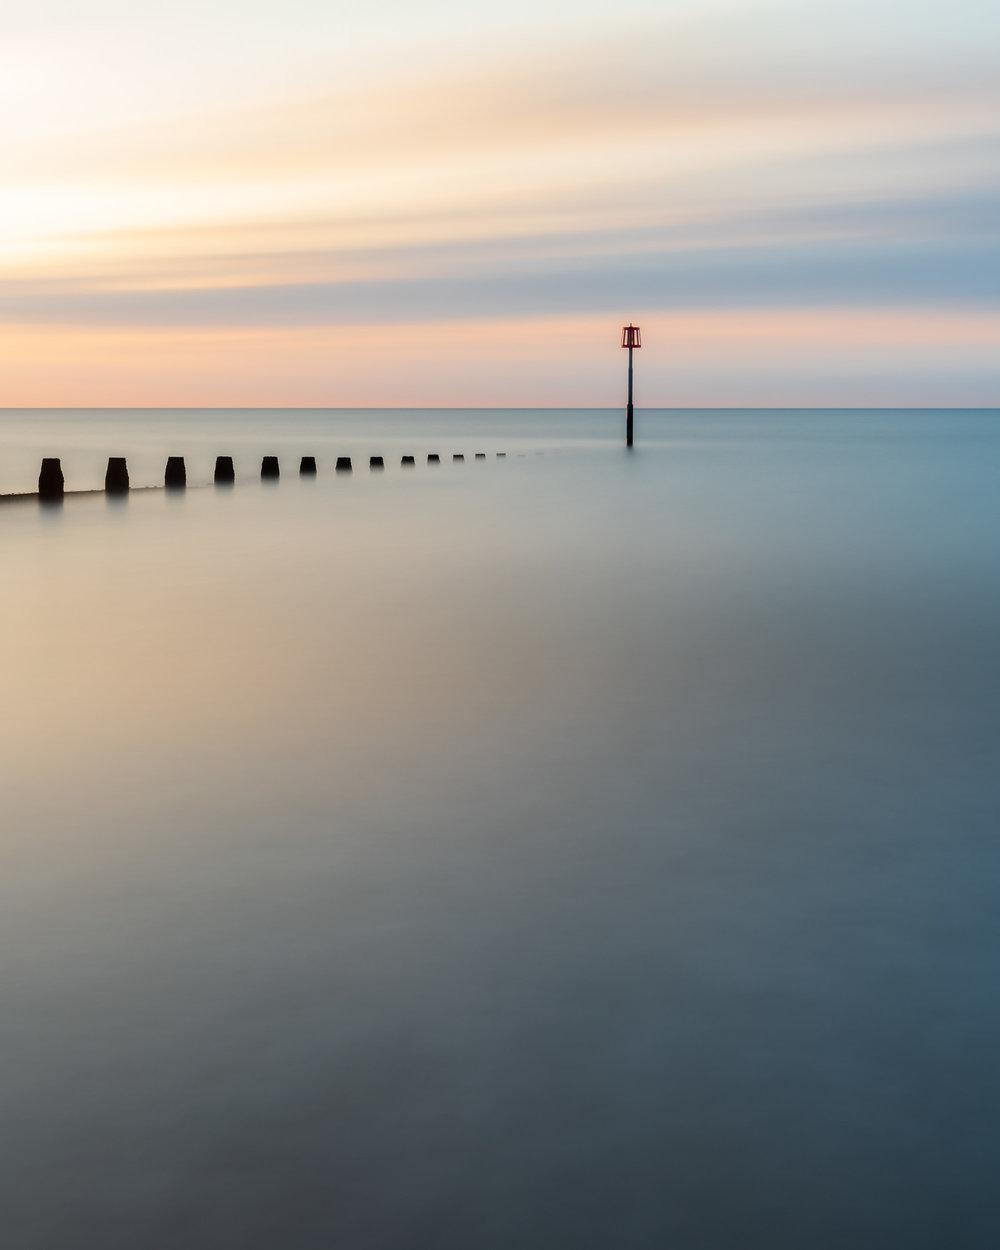 Into the Sea, Dawlish Warren, Devon  - Nikon D850, Nikkor 24-70 mm f/2.8 at 48 mm, 339 seconds at ISO 64, f/11. Lee Filters Circular Polariser and ND Grad,